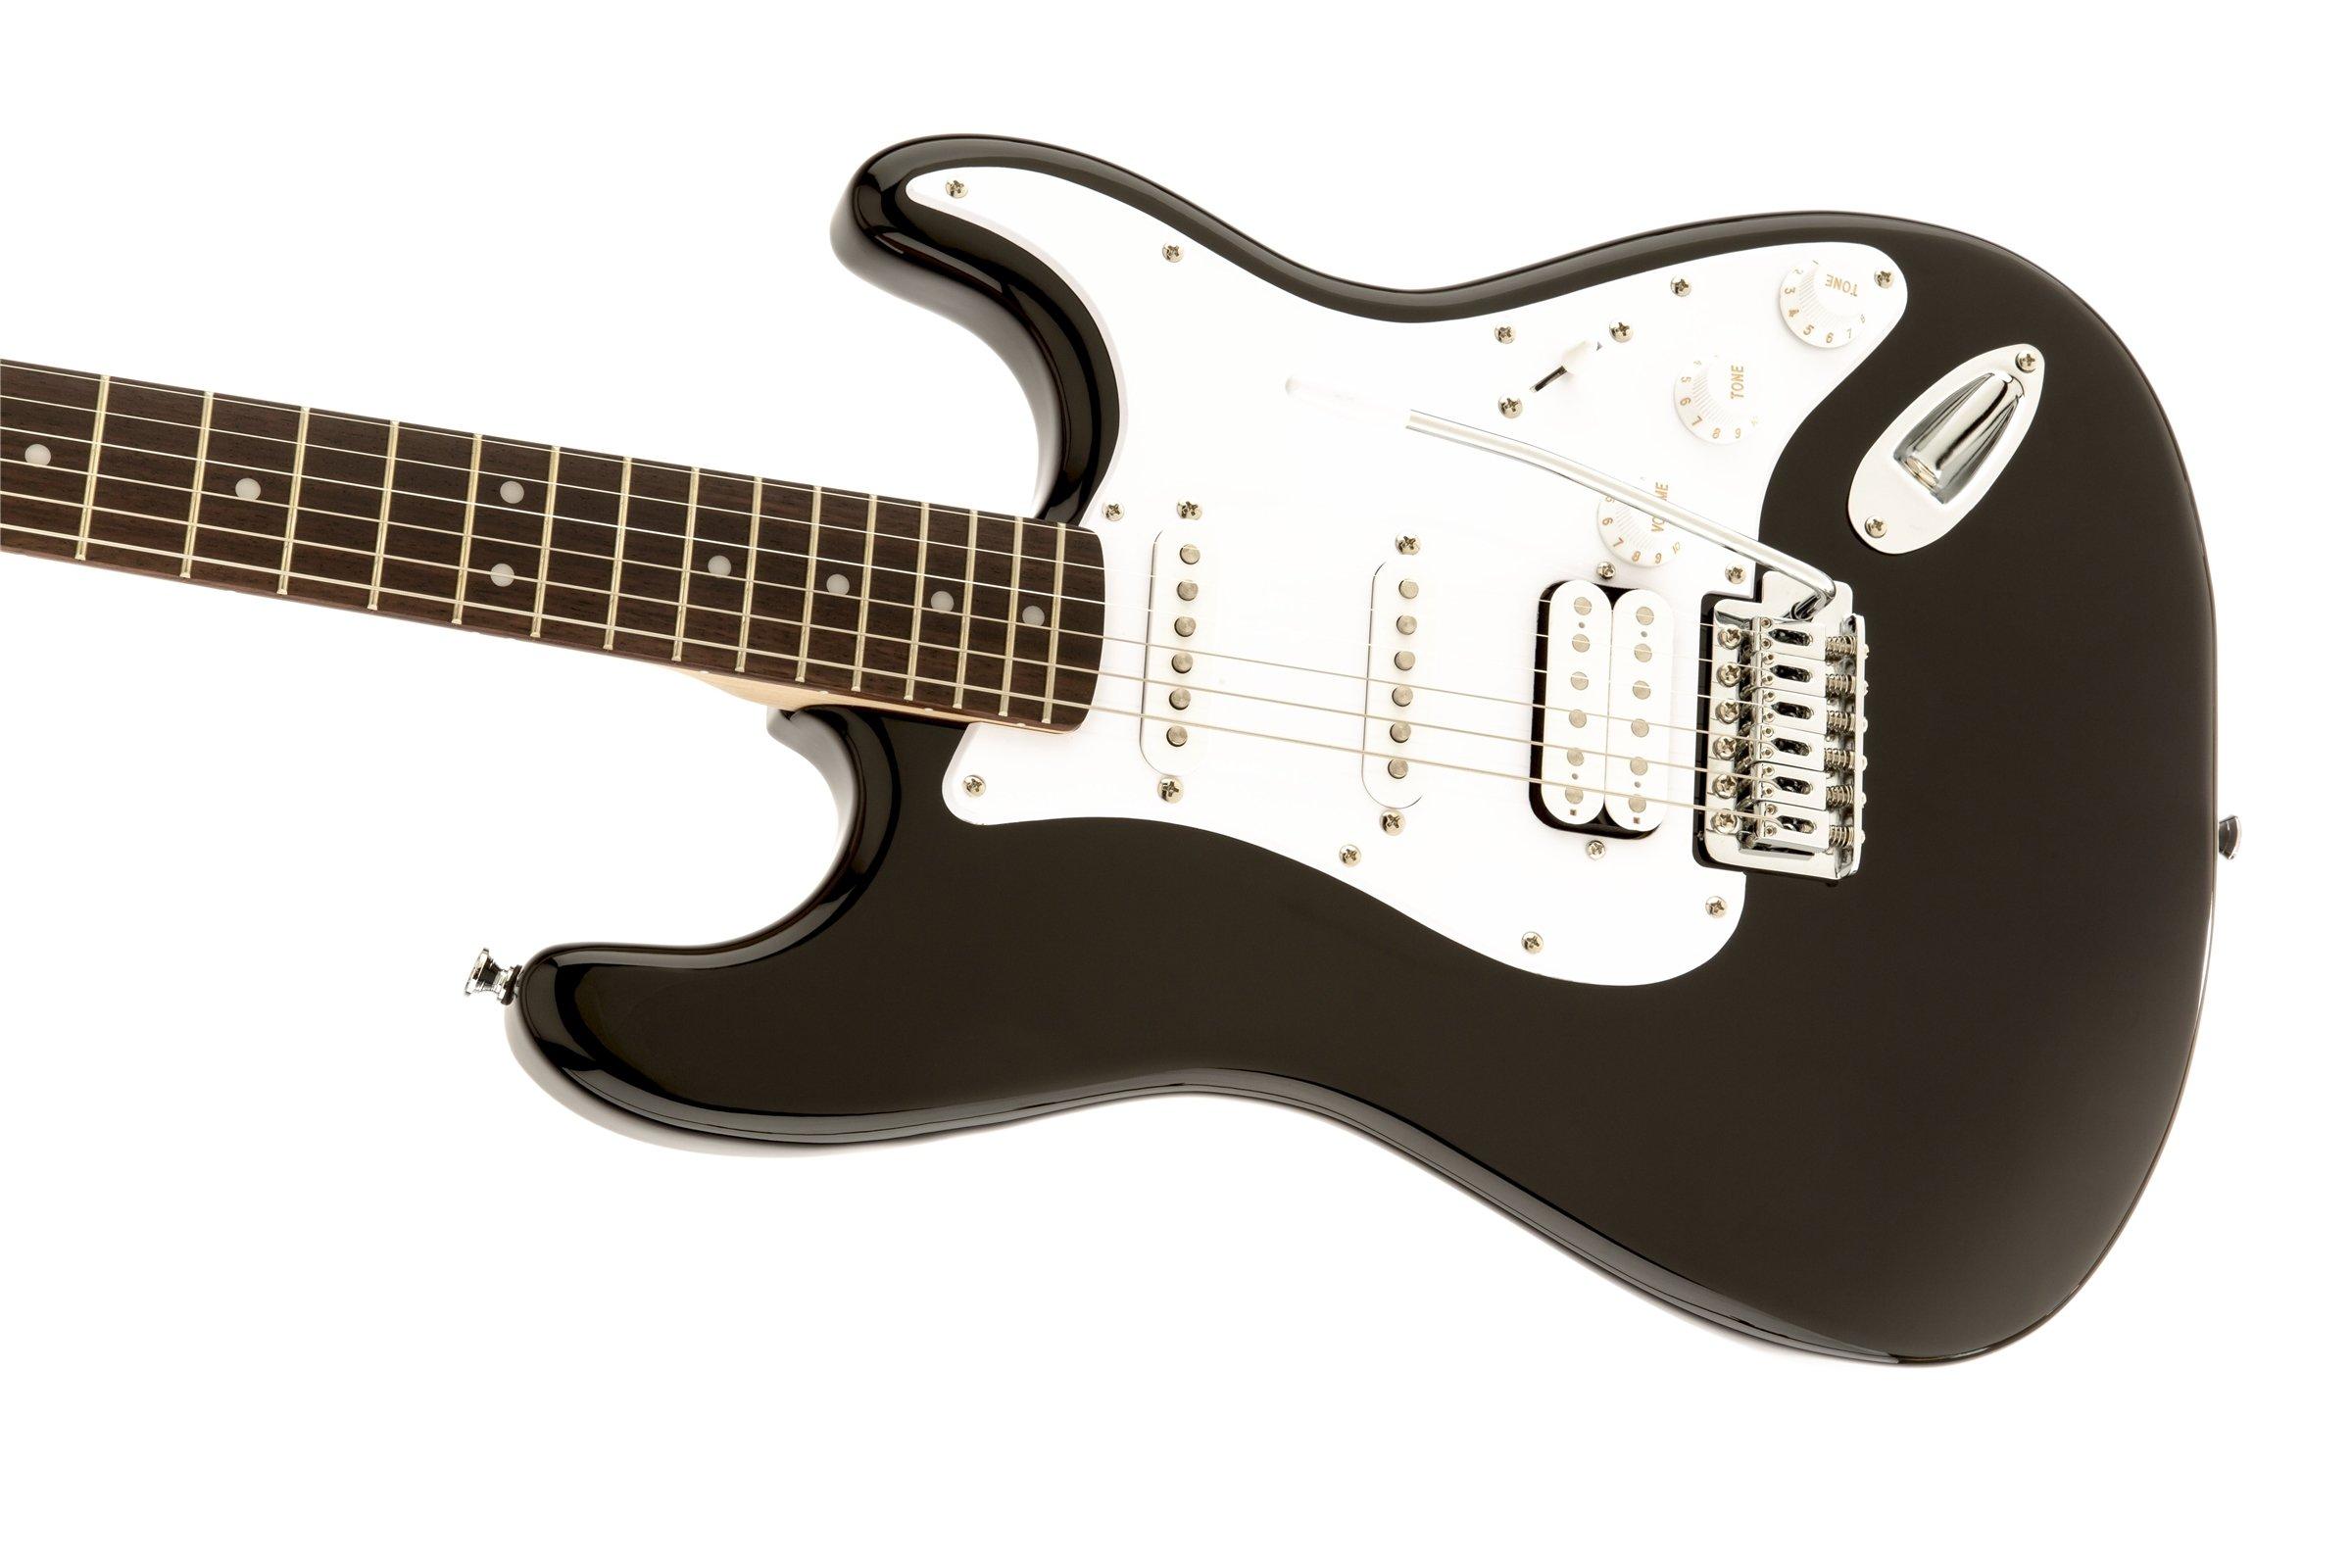 Chitarra Elettrica Fender Squier Stratocaster Bullet Black Nera